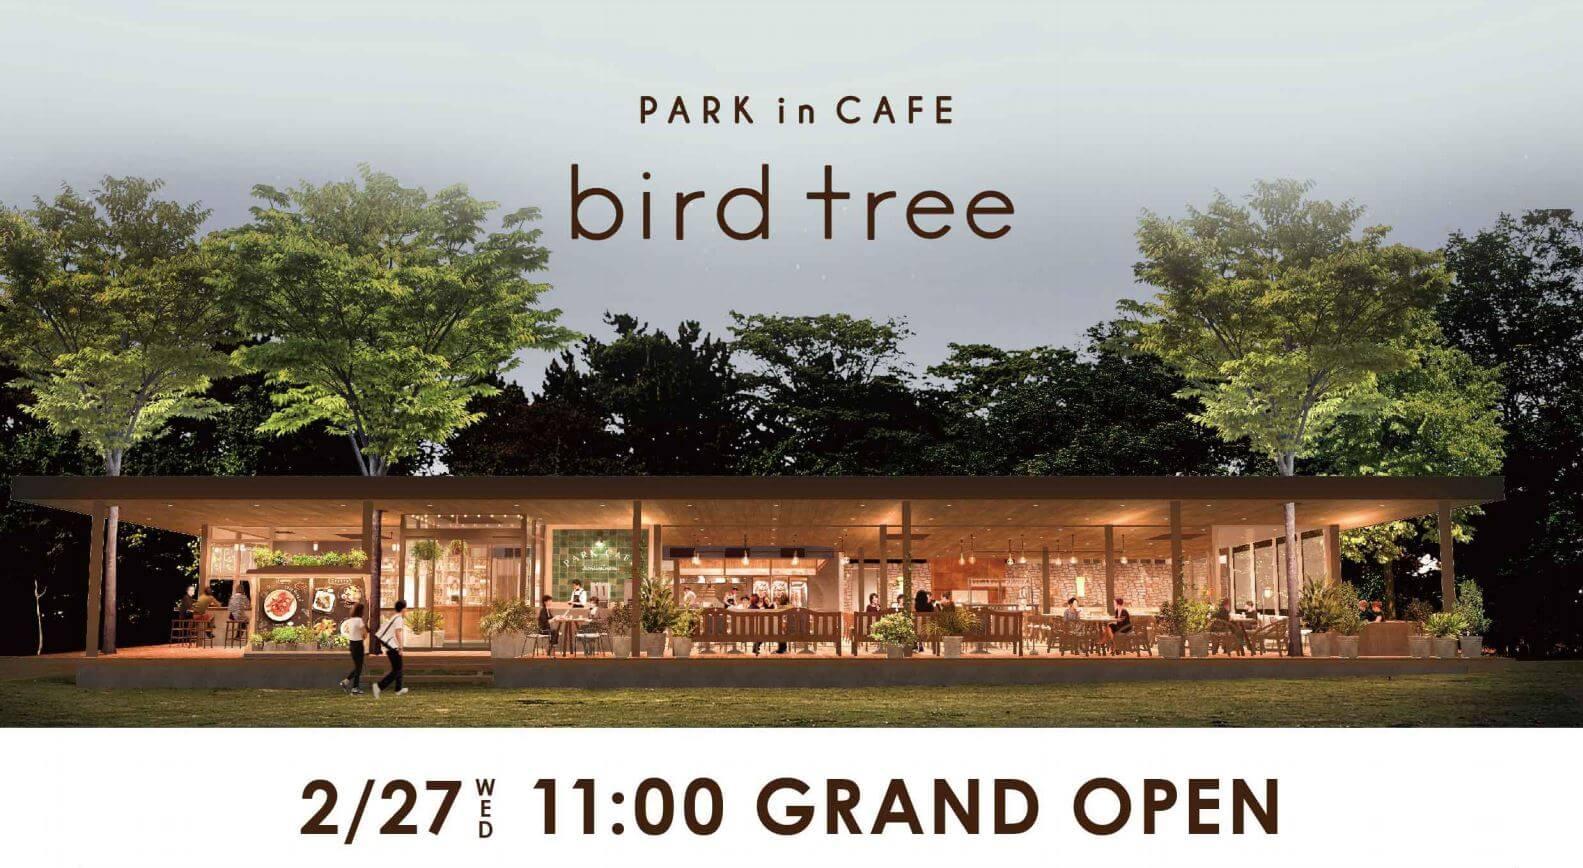 PARK in CAFE『bird tree(バードツリー)』の店舗情報